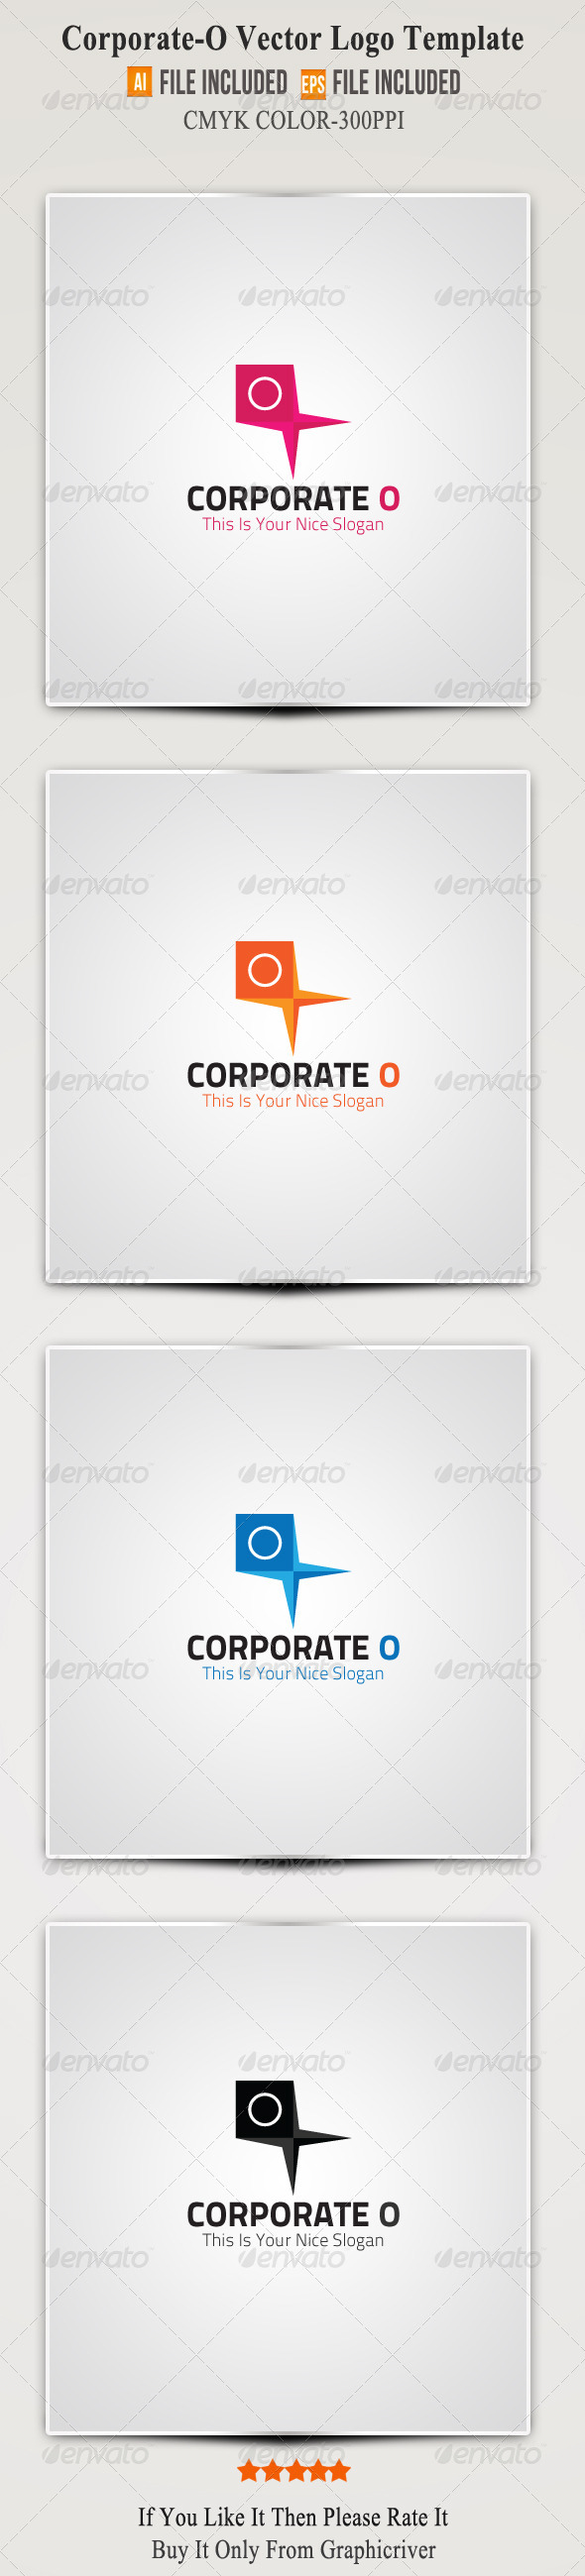 GraphicRiver Corporate O Logo Template 5002604